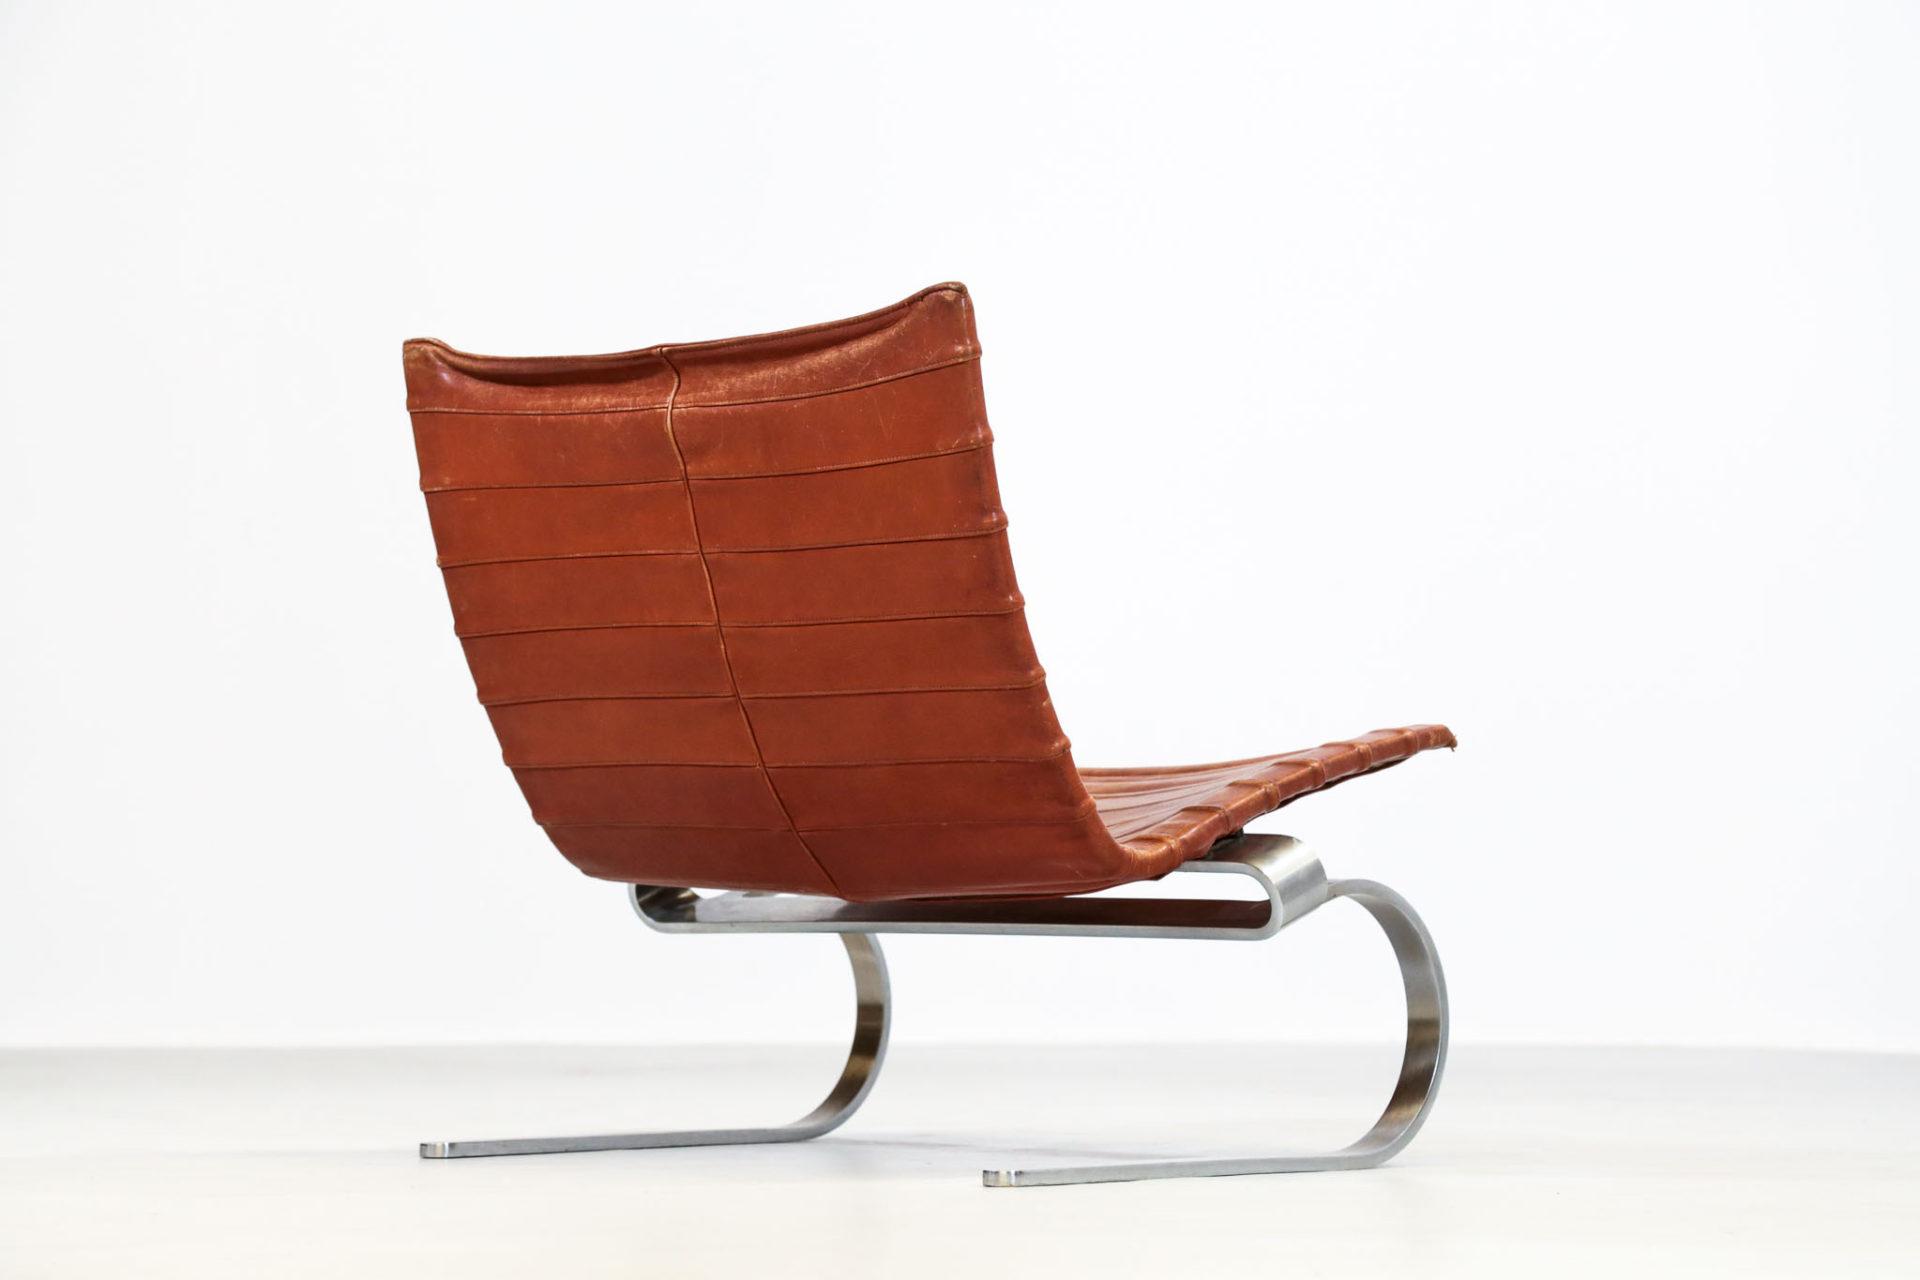 PK20 Poul Kjaerholm chauffeuse danois design scandinavian danke galerie 40